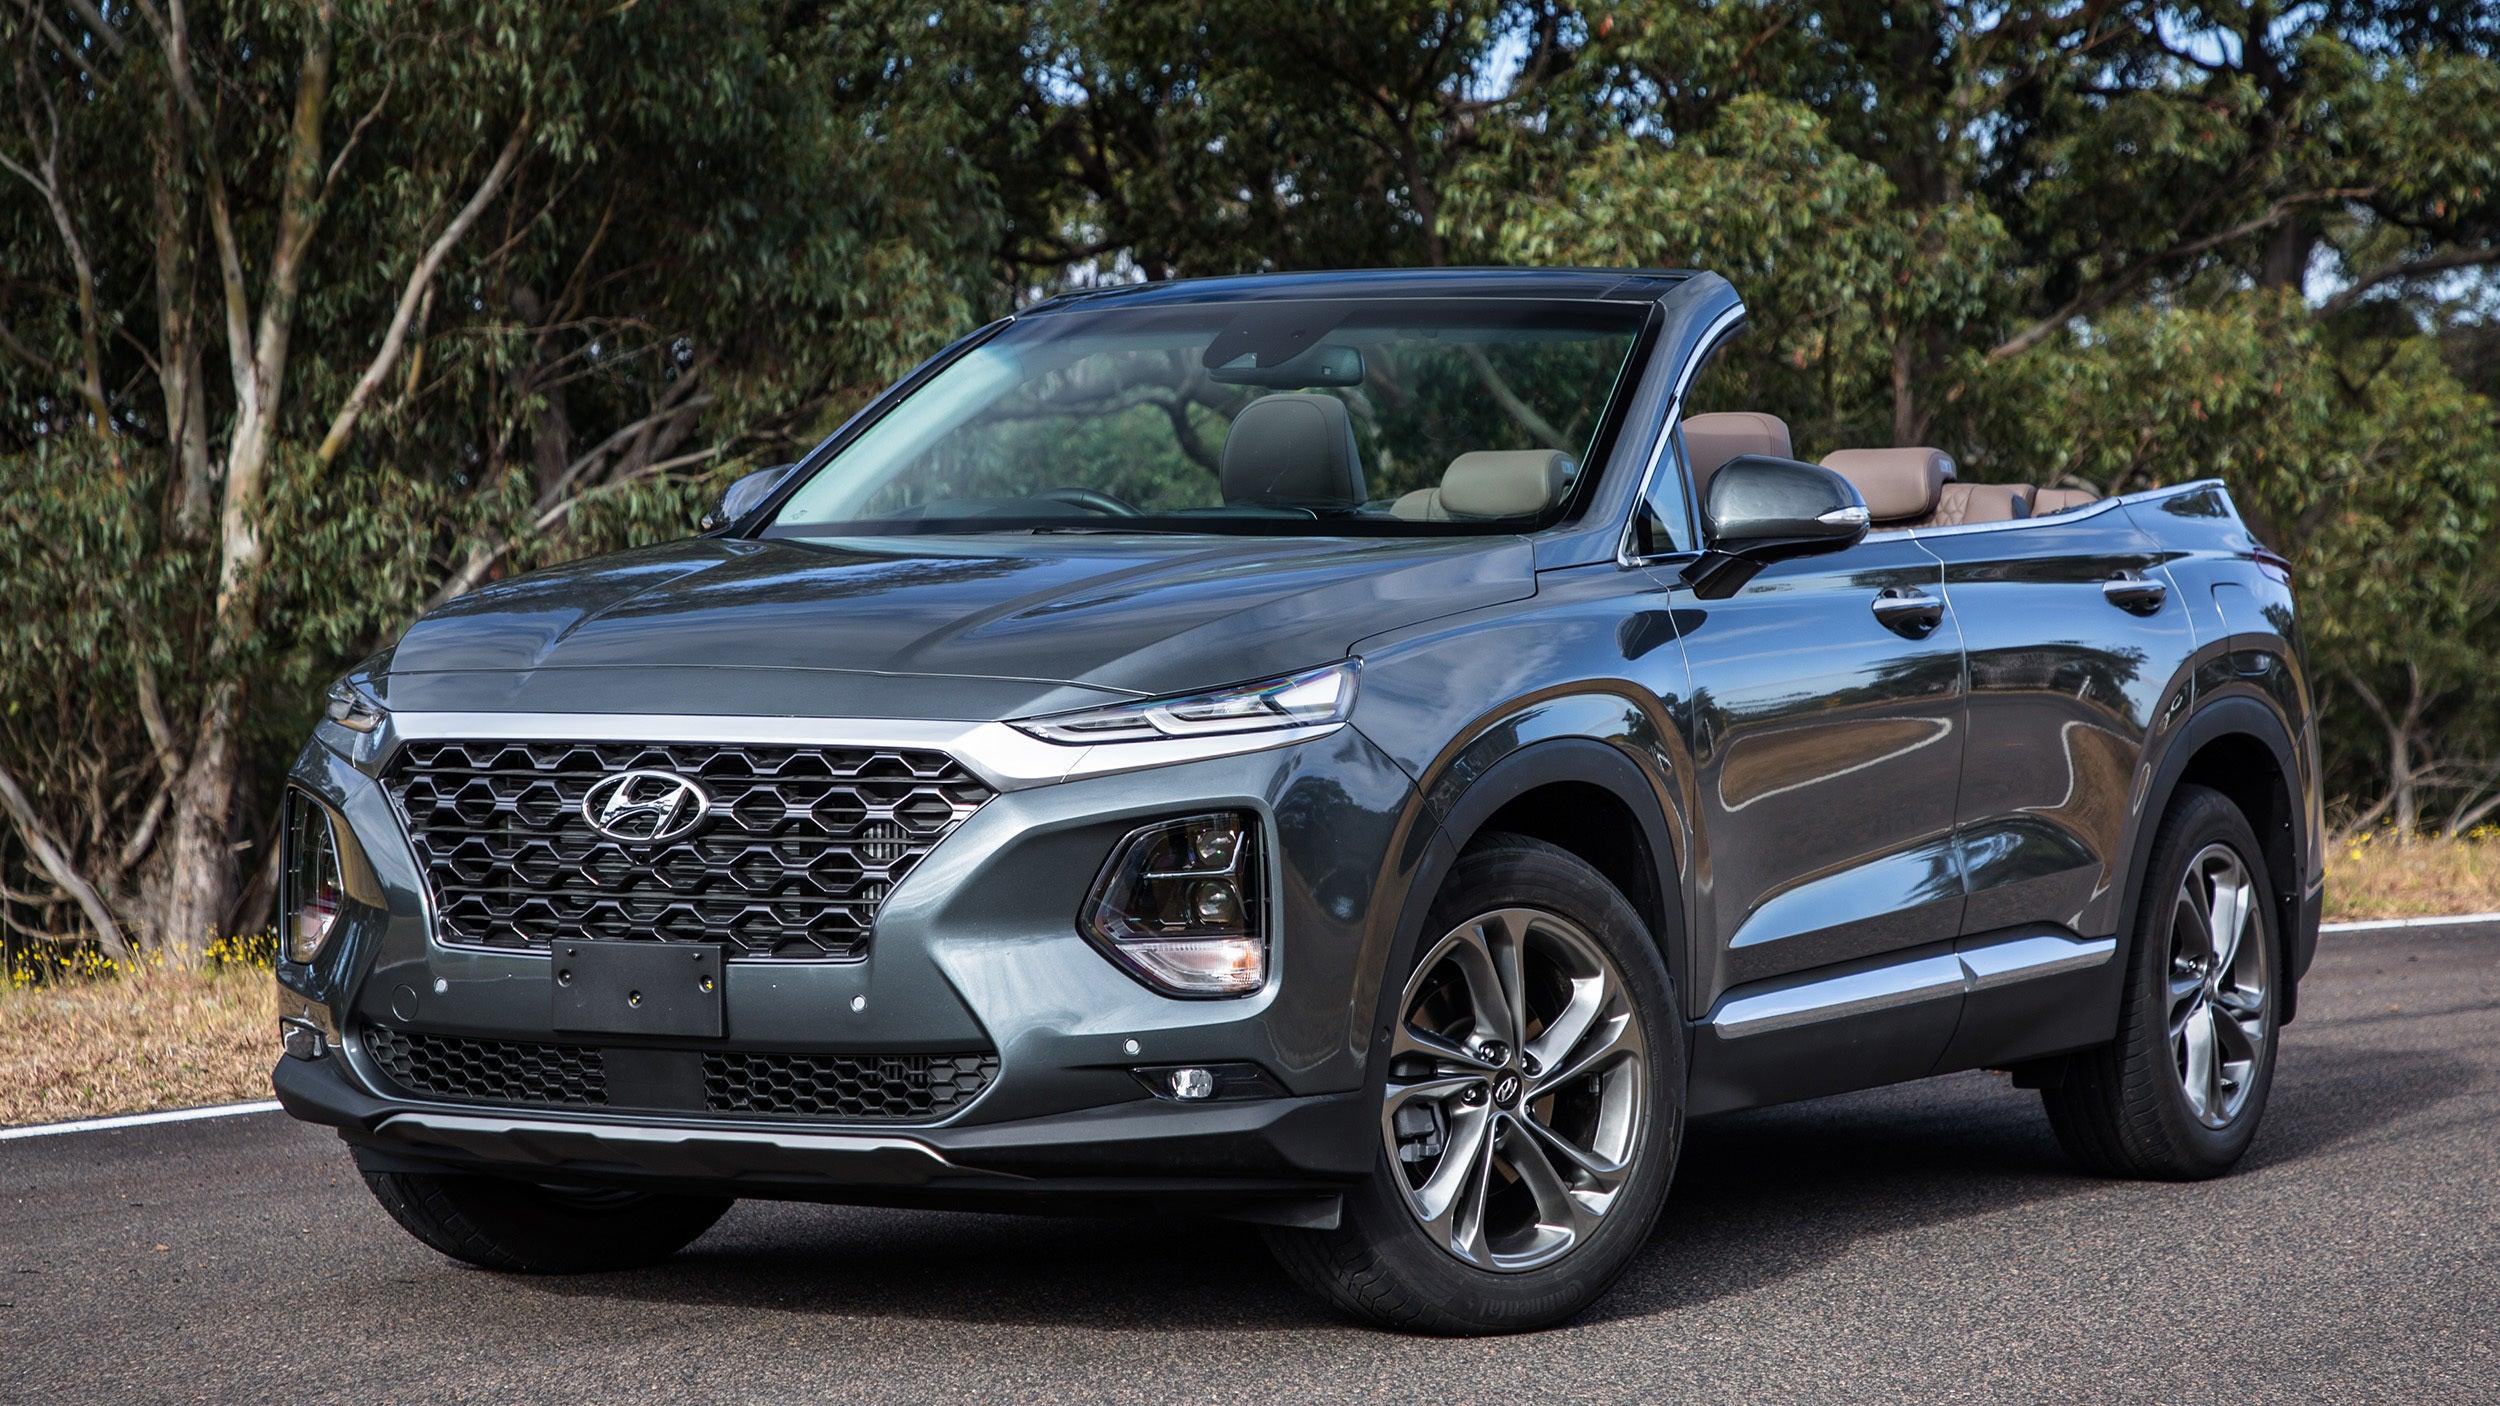 2018 - [Hyundai] Santa Fe IV - Page 3 Km41ze44lrdqxlrtqq8q